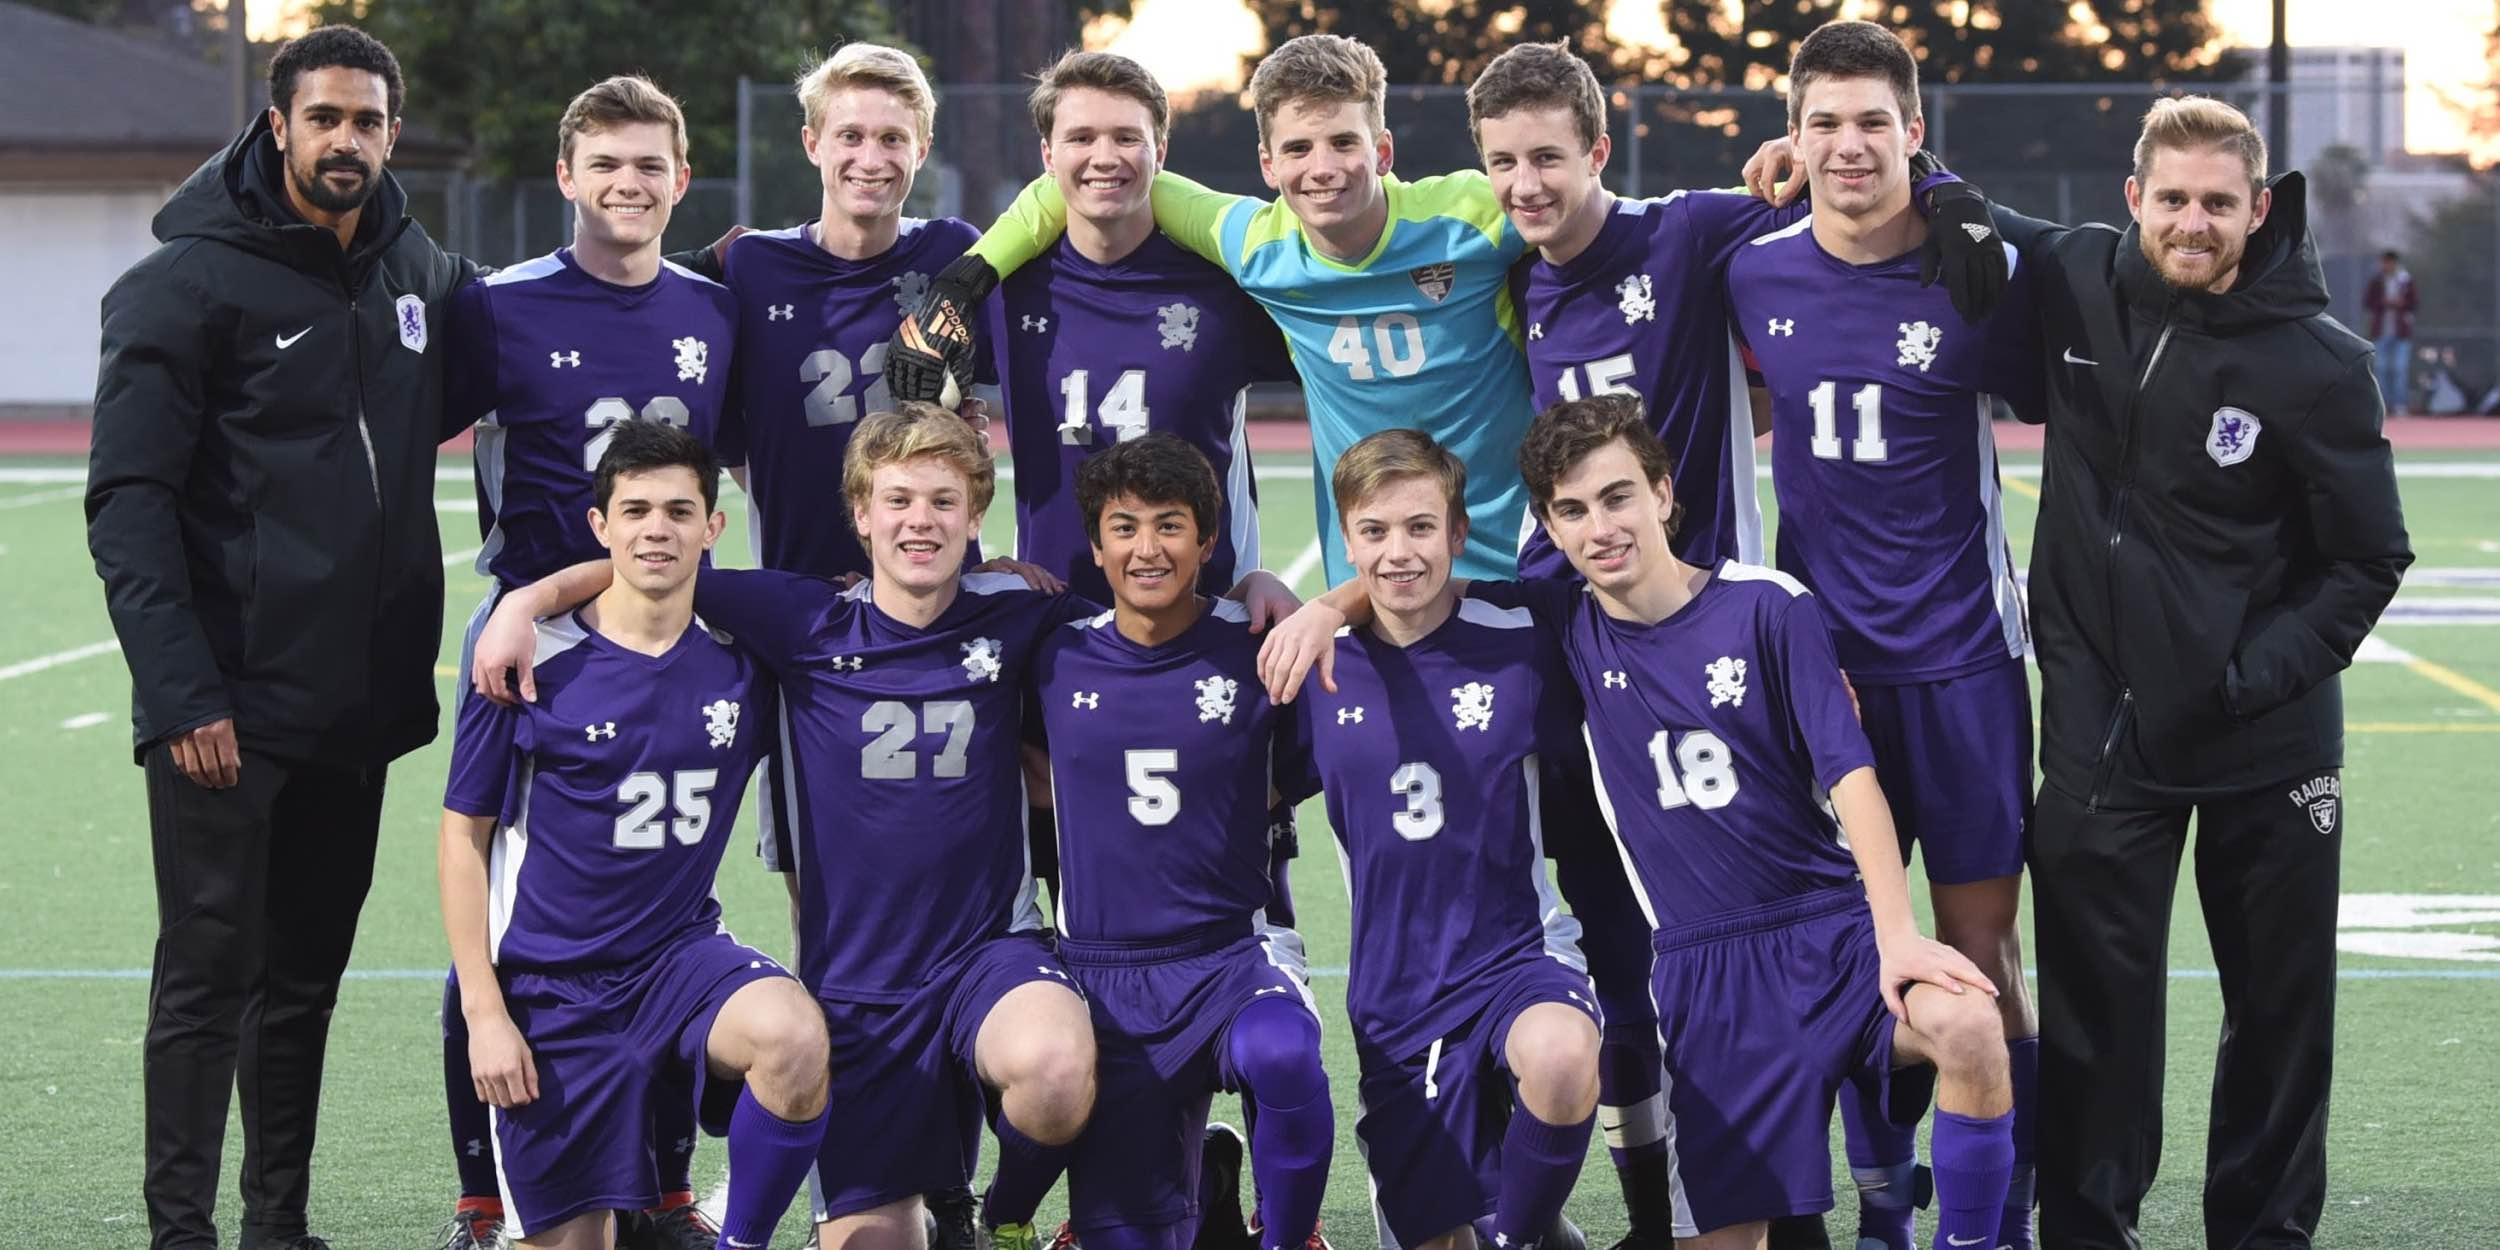 Soccer Boys 3.jpg